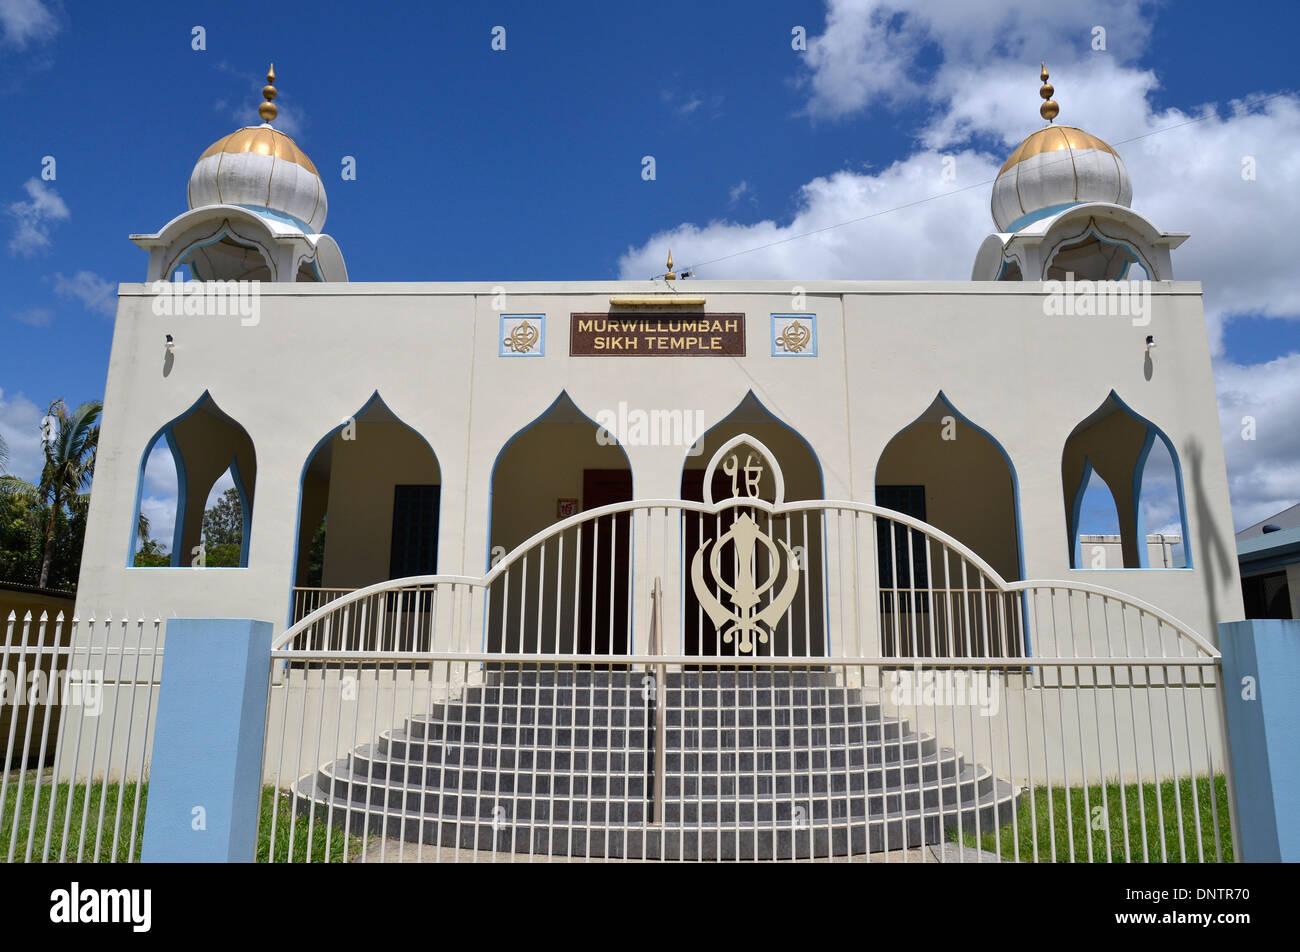 Guru Nanak Sikh Temple - Murwillumbah , nsw, australia - Stock Image